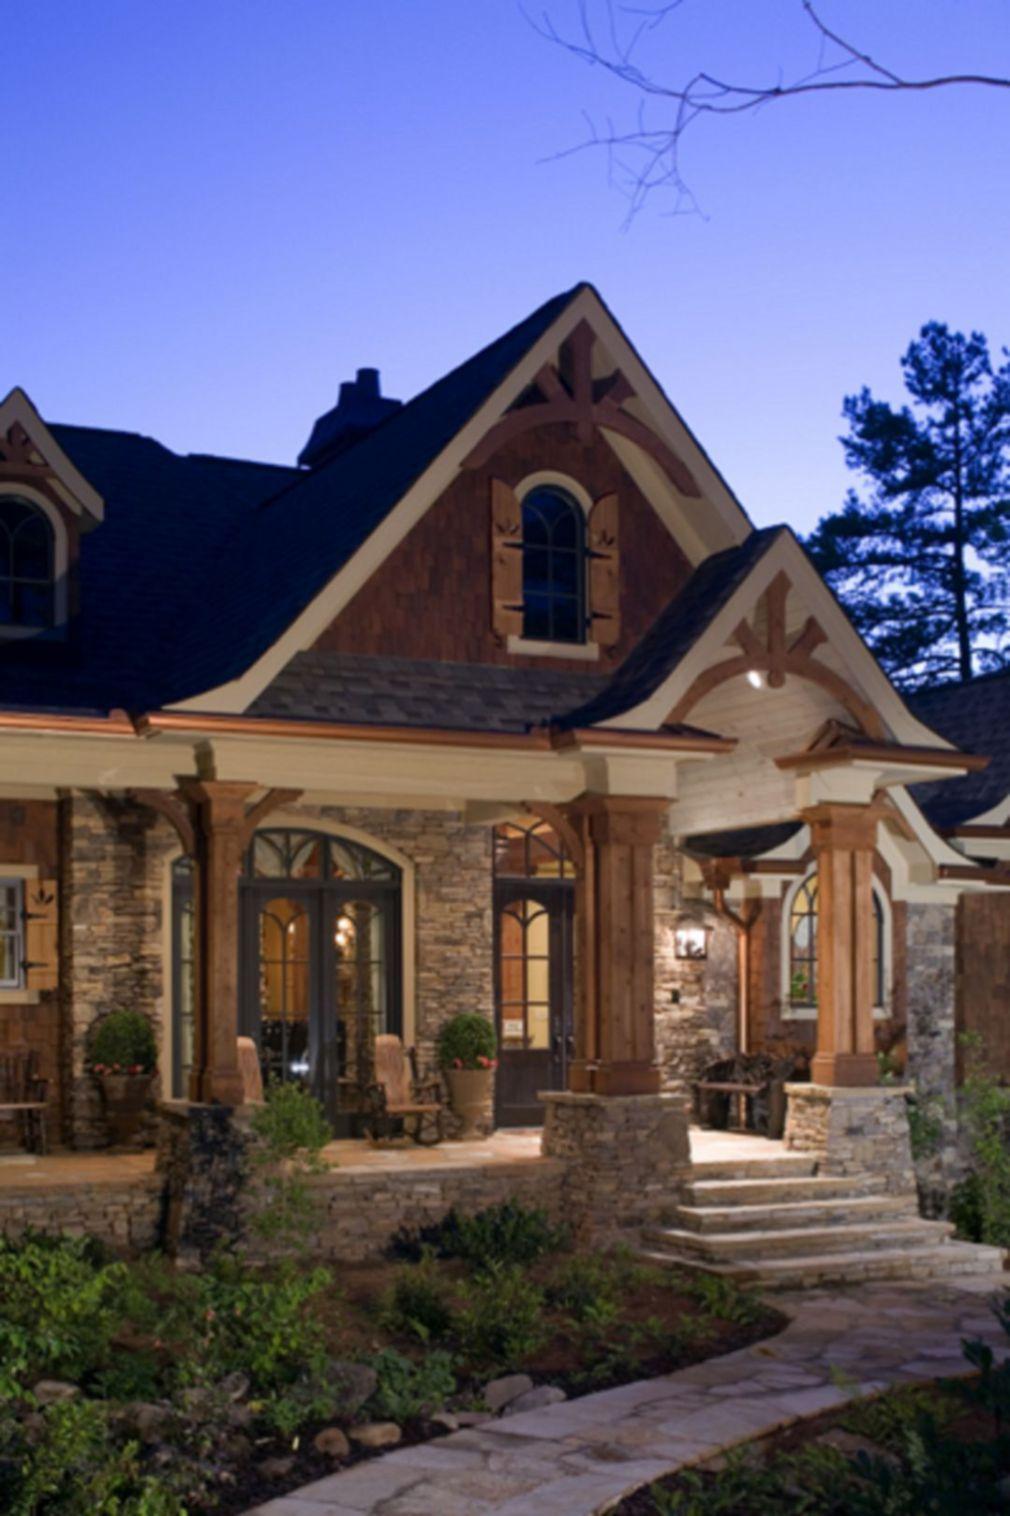 Stone House Design Ideas 417 House Exterior My Dream Home House Plans